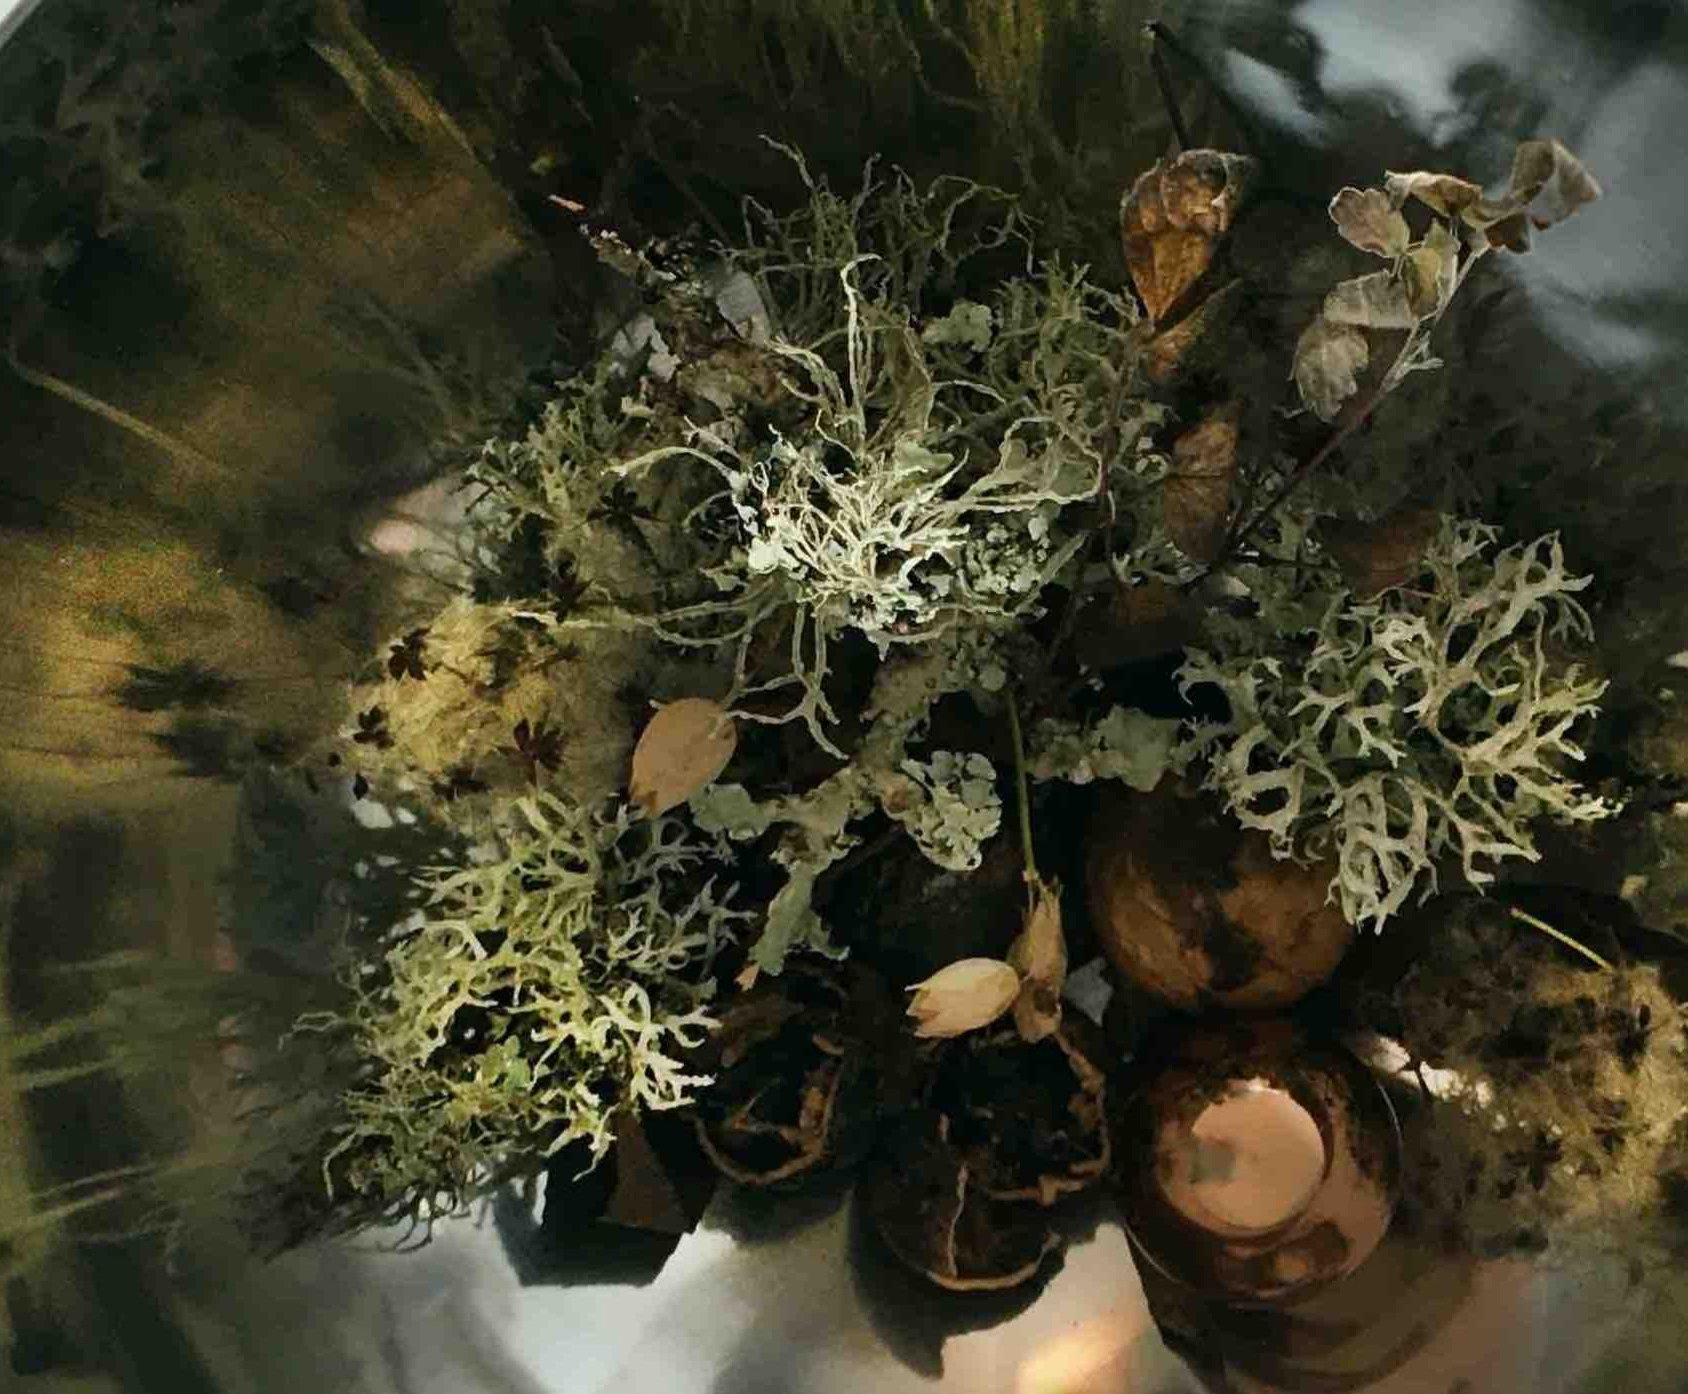 nic gotch photography moss